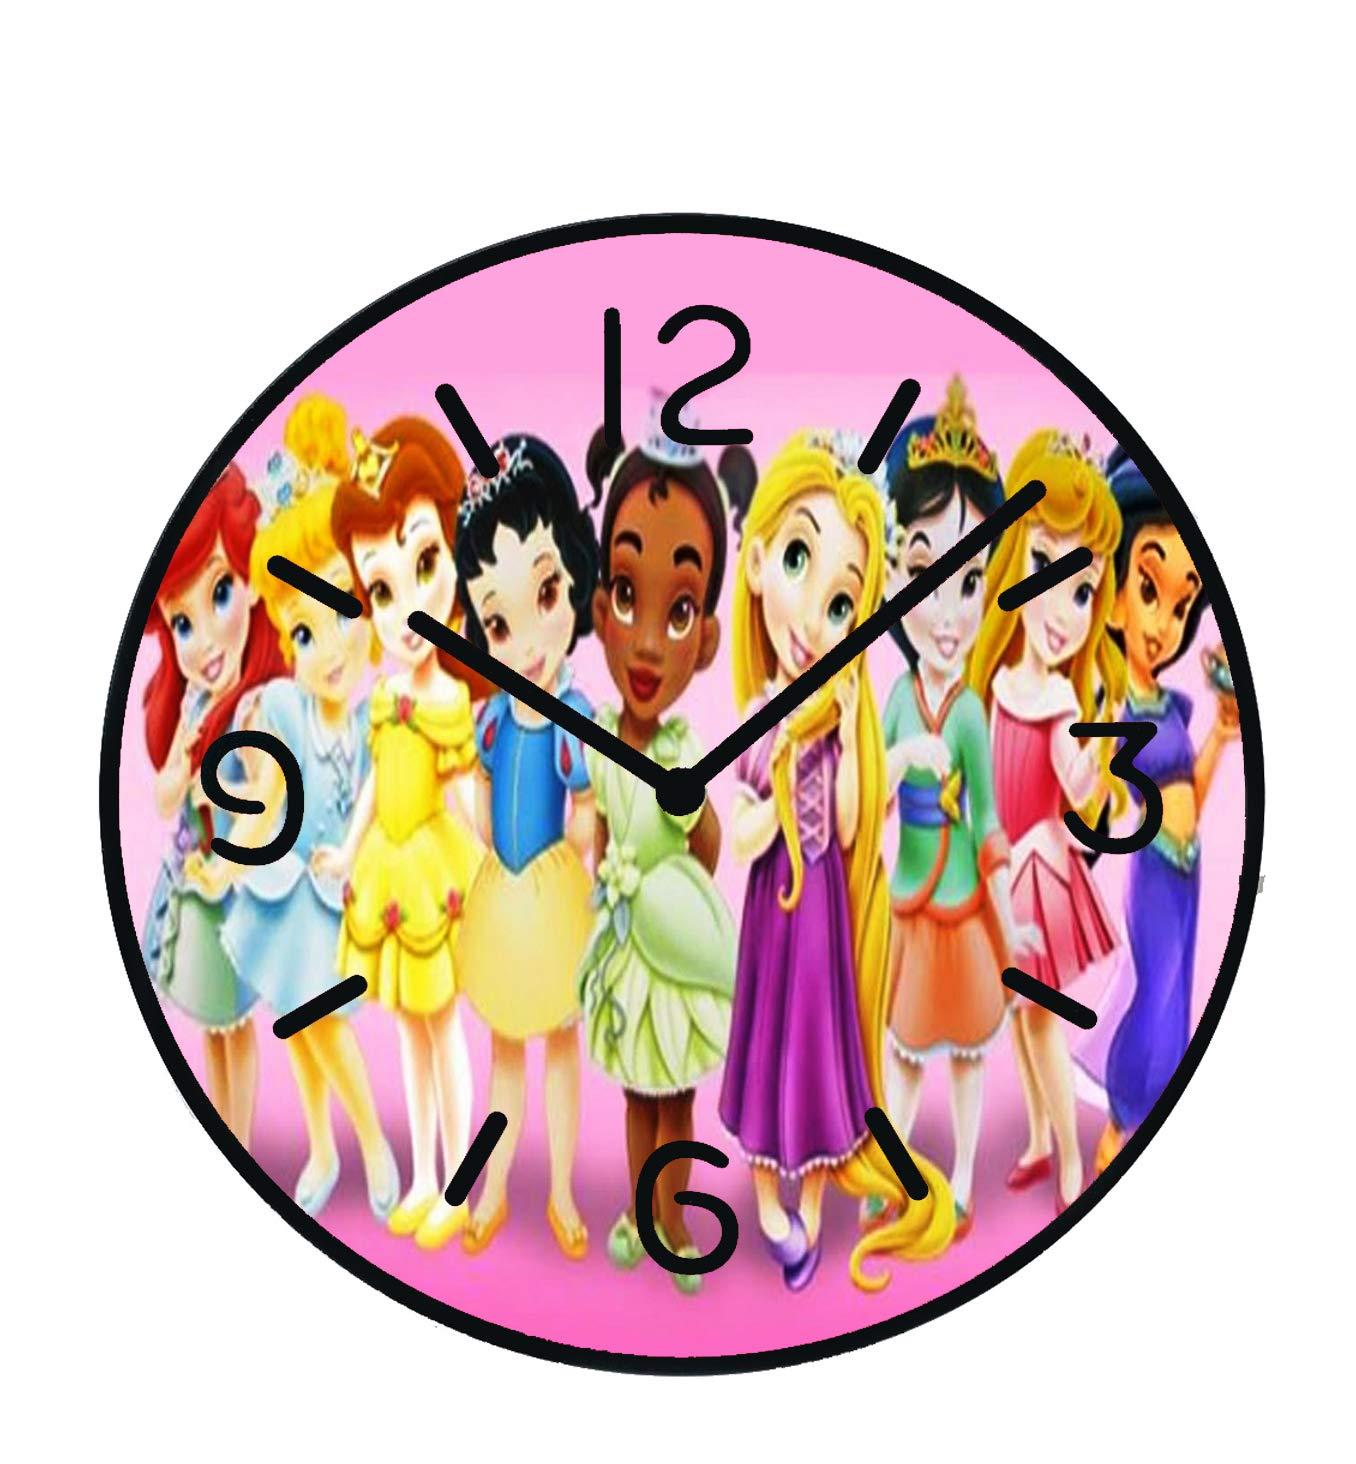 Buy Anni69 Little Princess Kids Stading All Together Online At Low